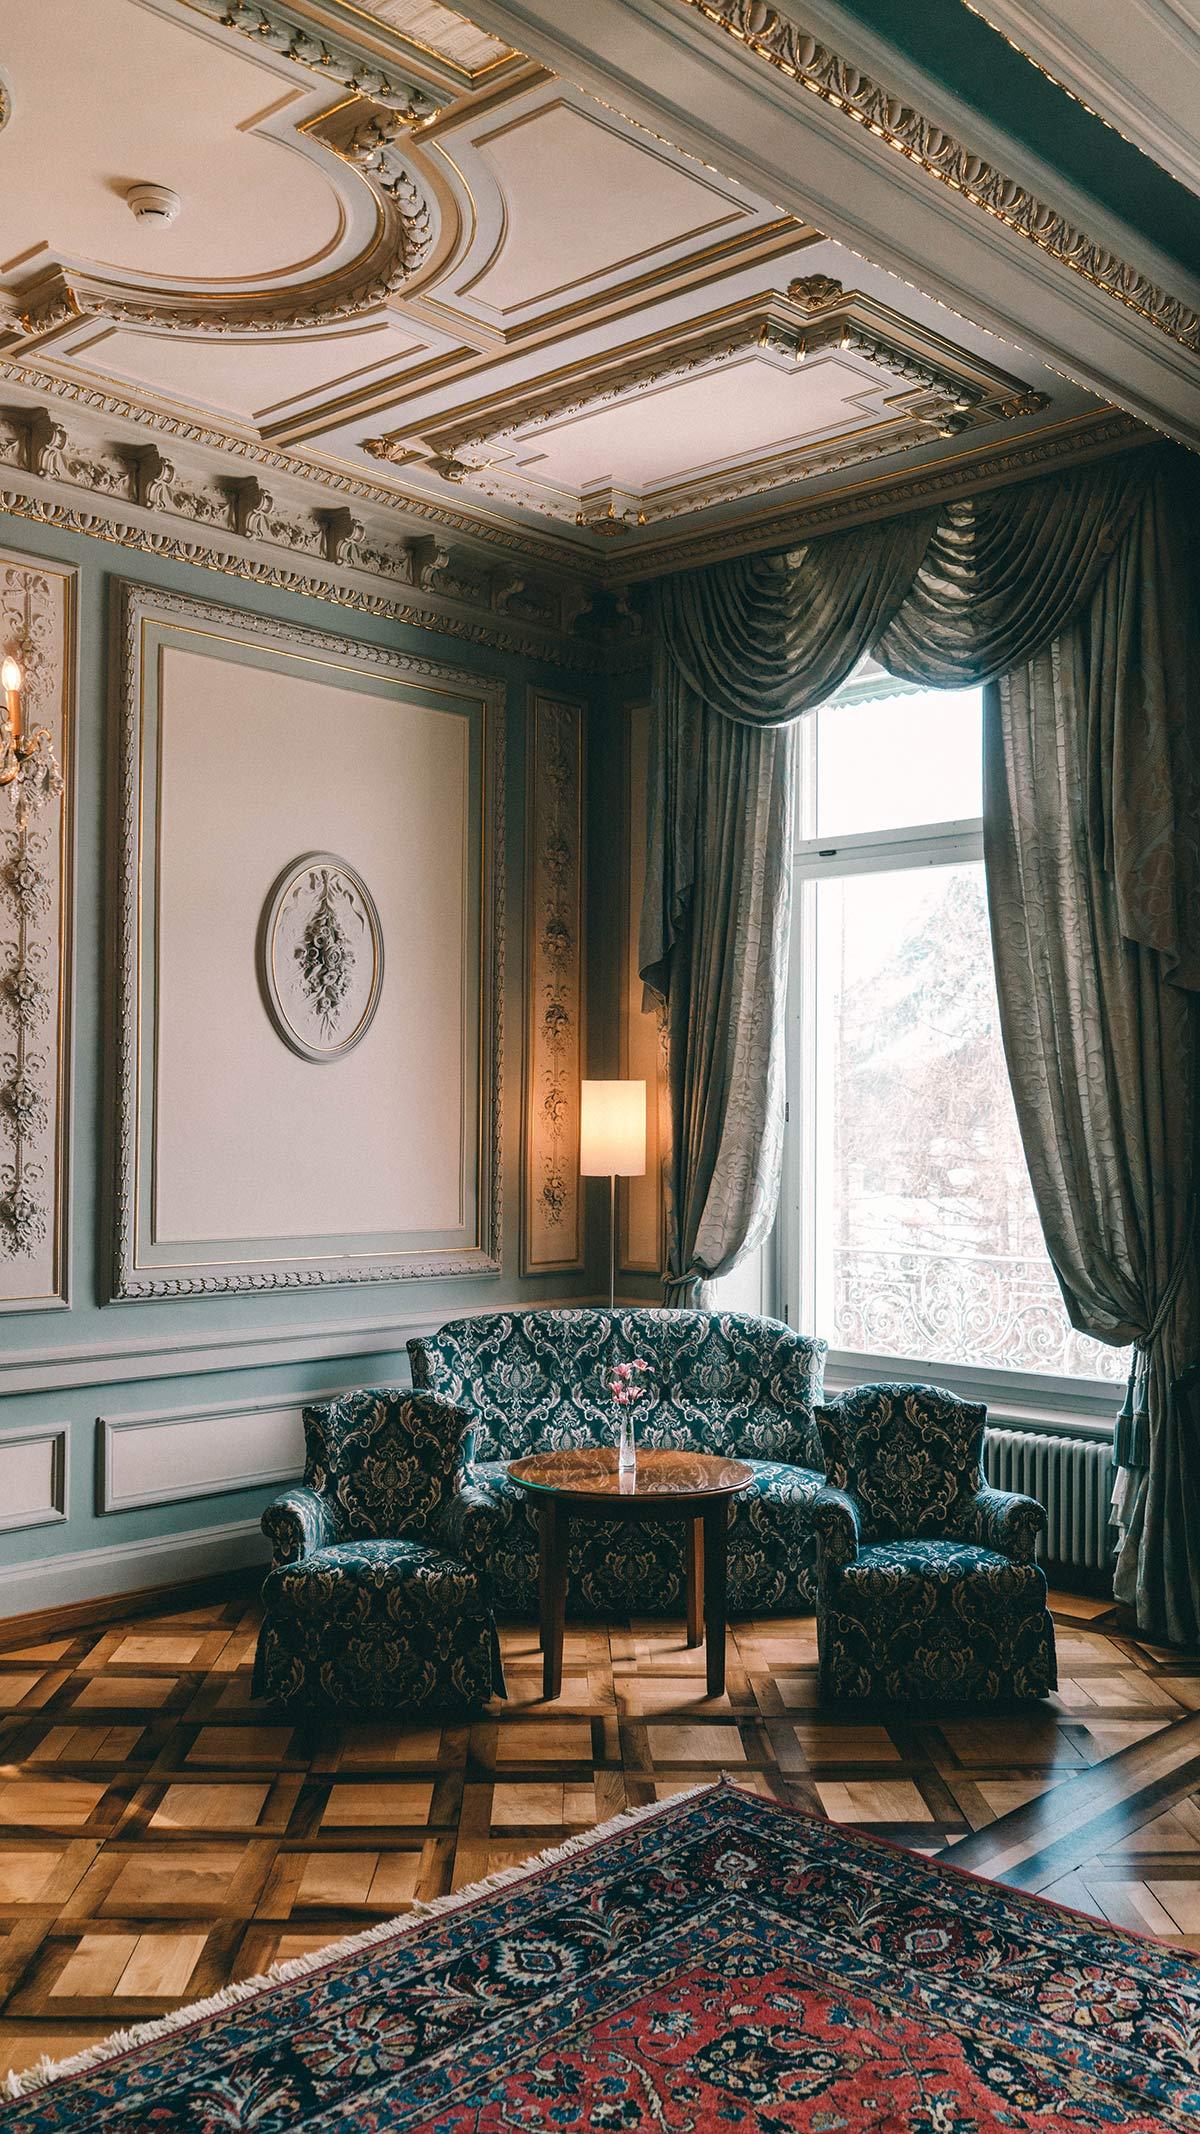 Grand Hotel Kronenhof Salon